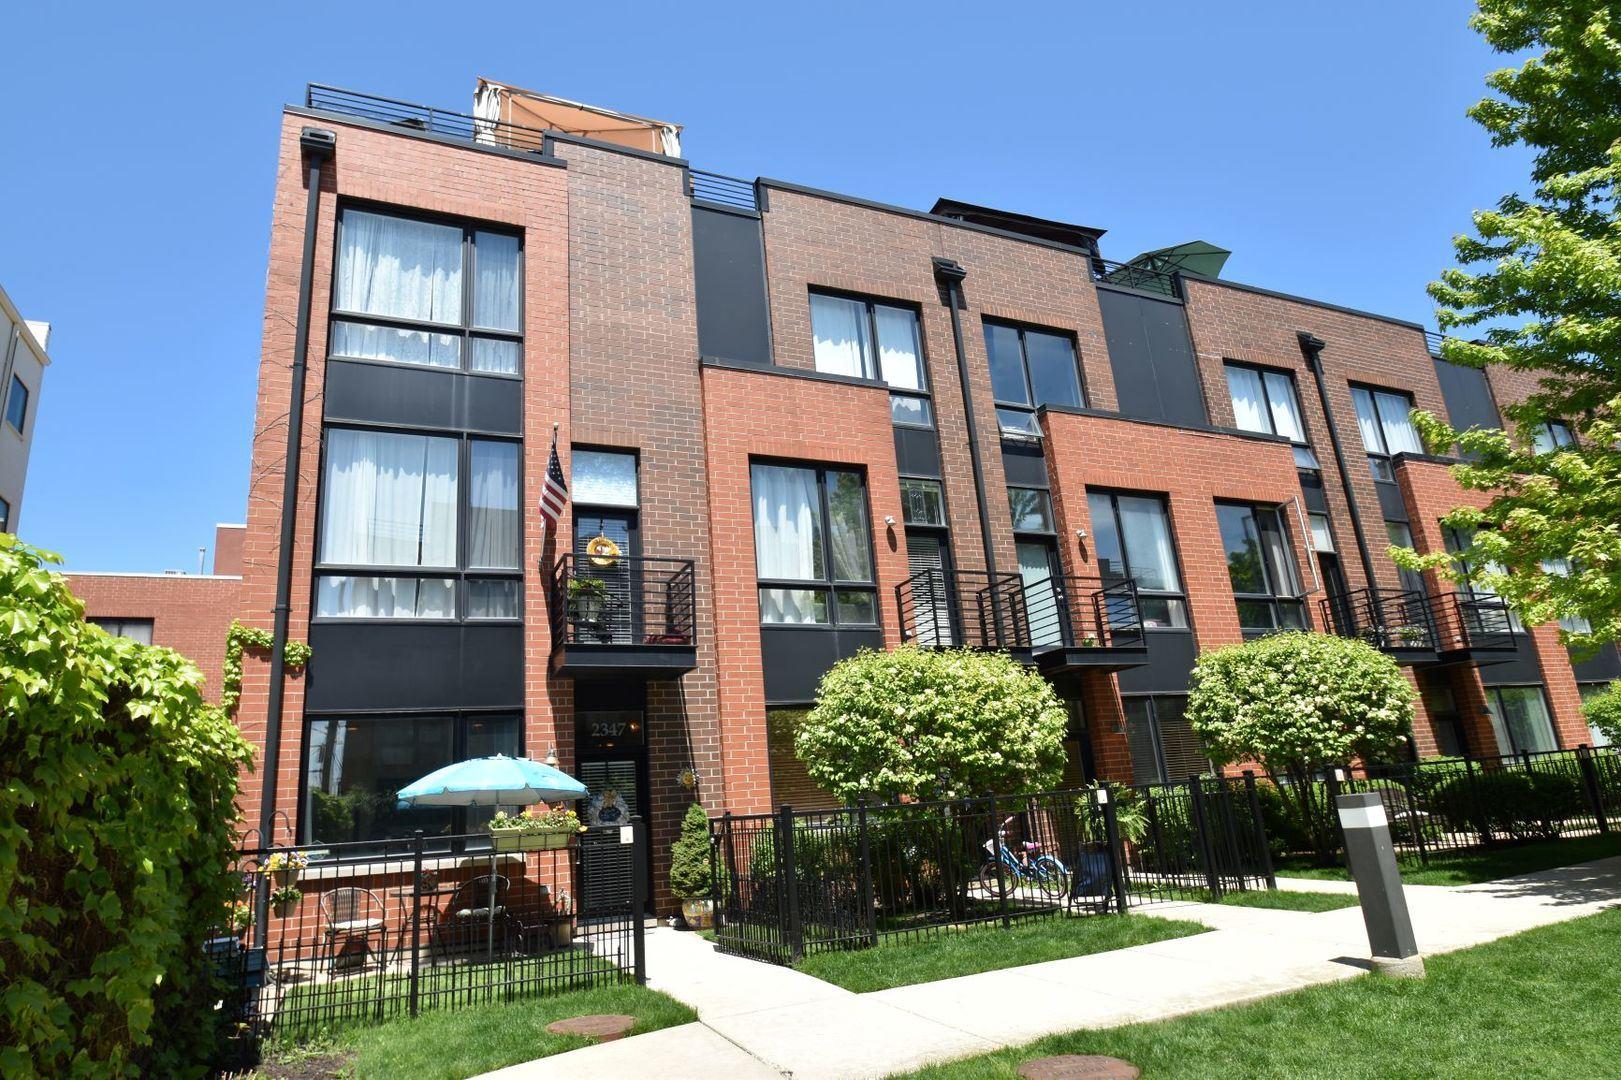 2347 W George Street, Chicago, IL 60618 - MLS#: 10722011